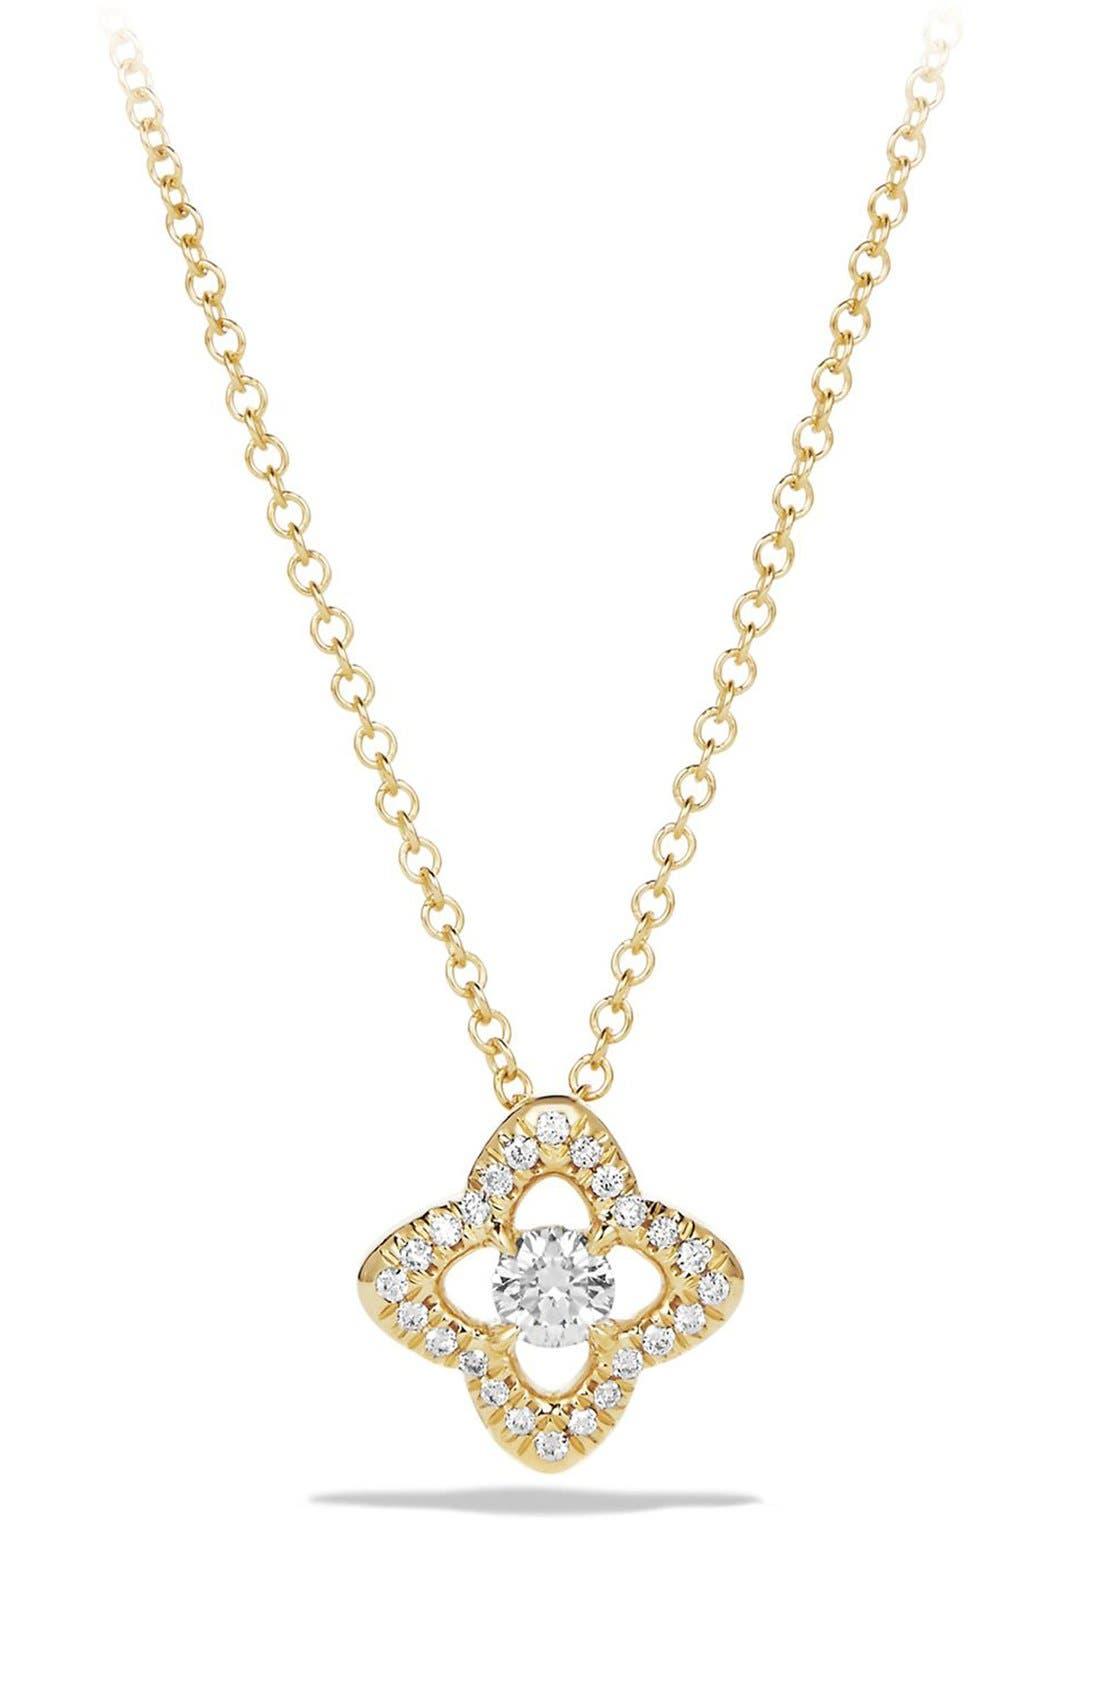 DAVID YURMAN Venetian Quatrefoil Necklace with Diamonds in Gold